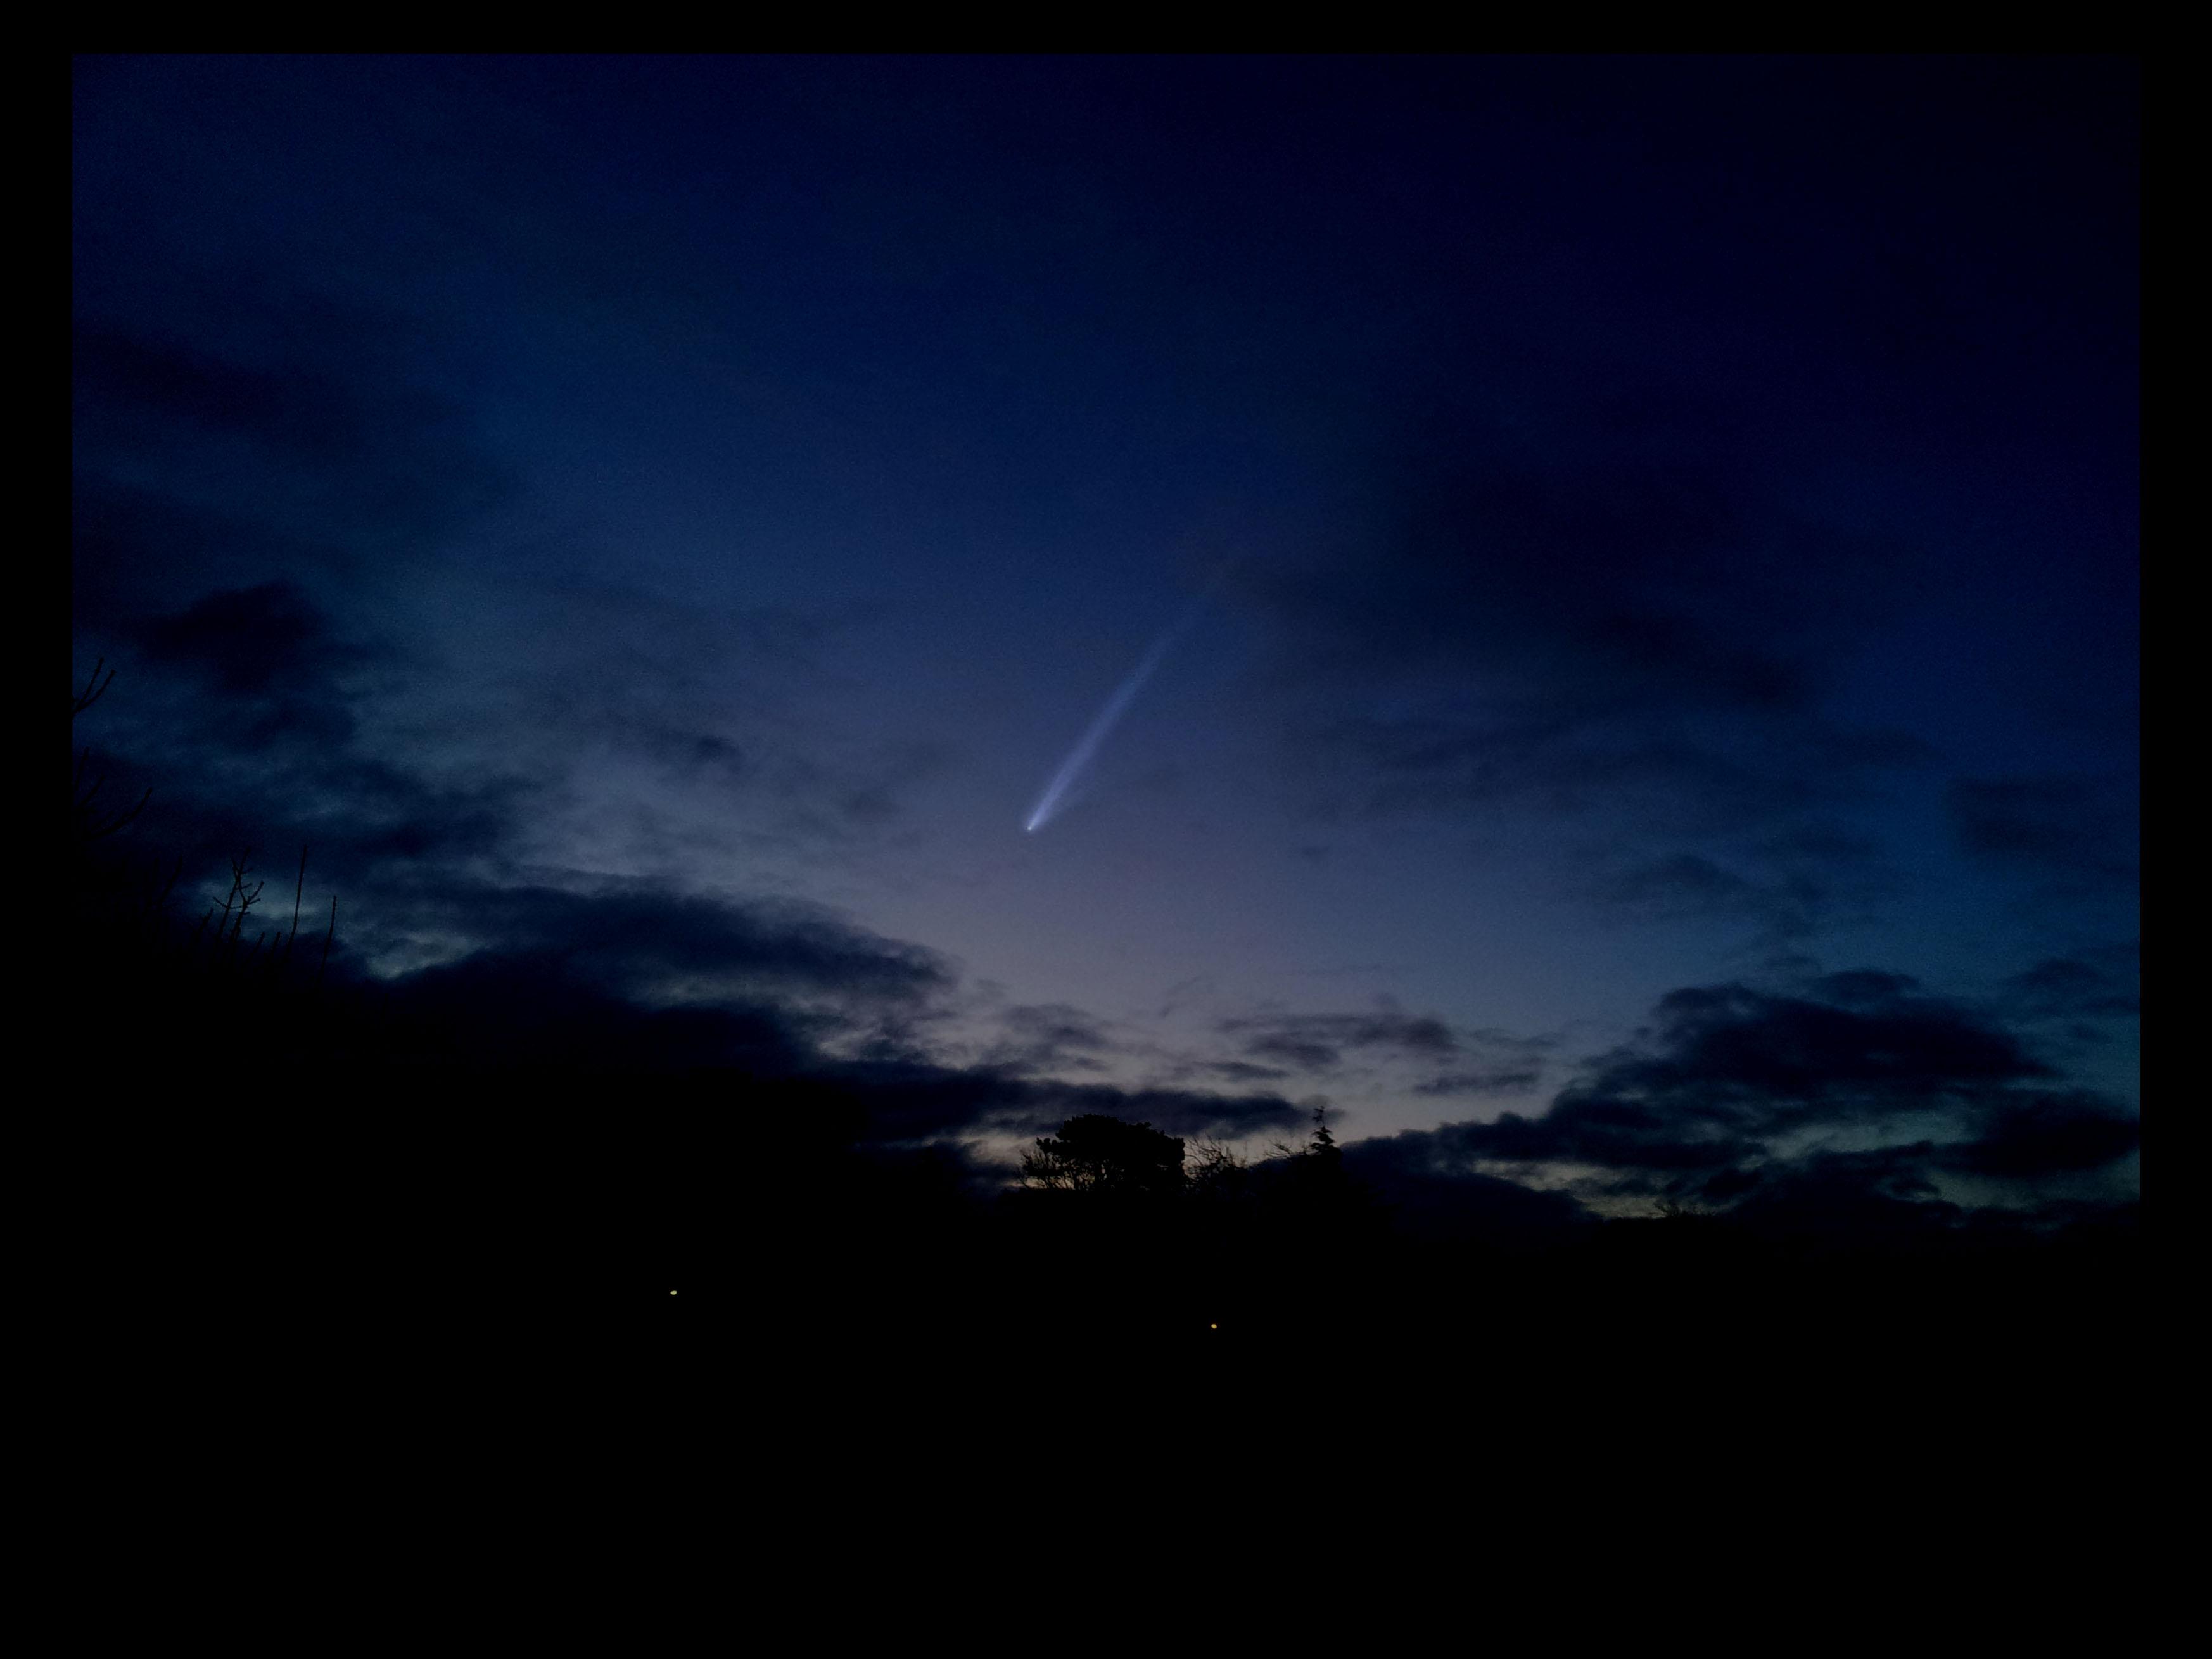 late nov アイソン彗星が消滅した可能性?予想よりも多くの塵が観測される!